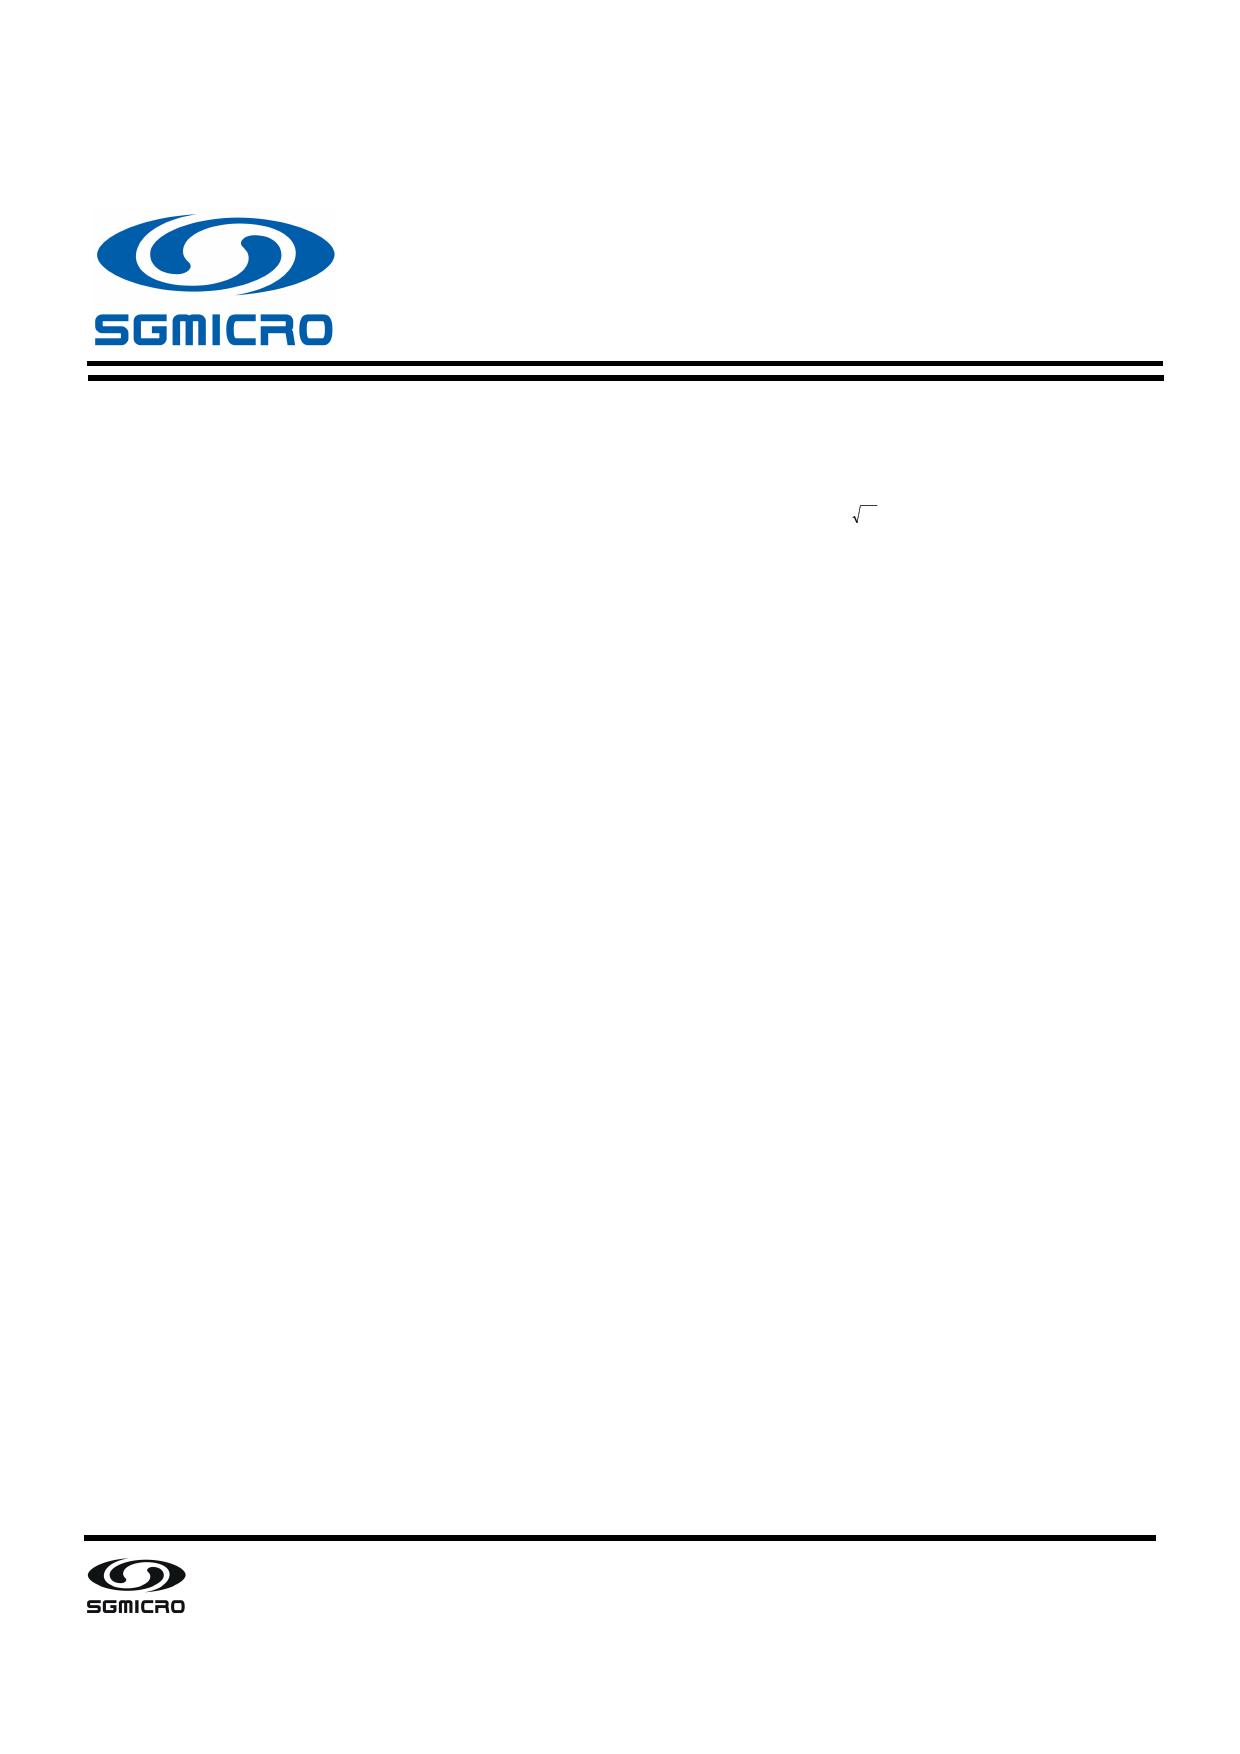 SGM8934 datasheet, circuit